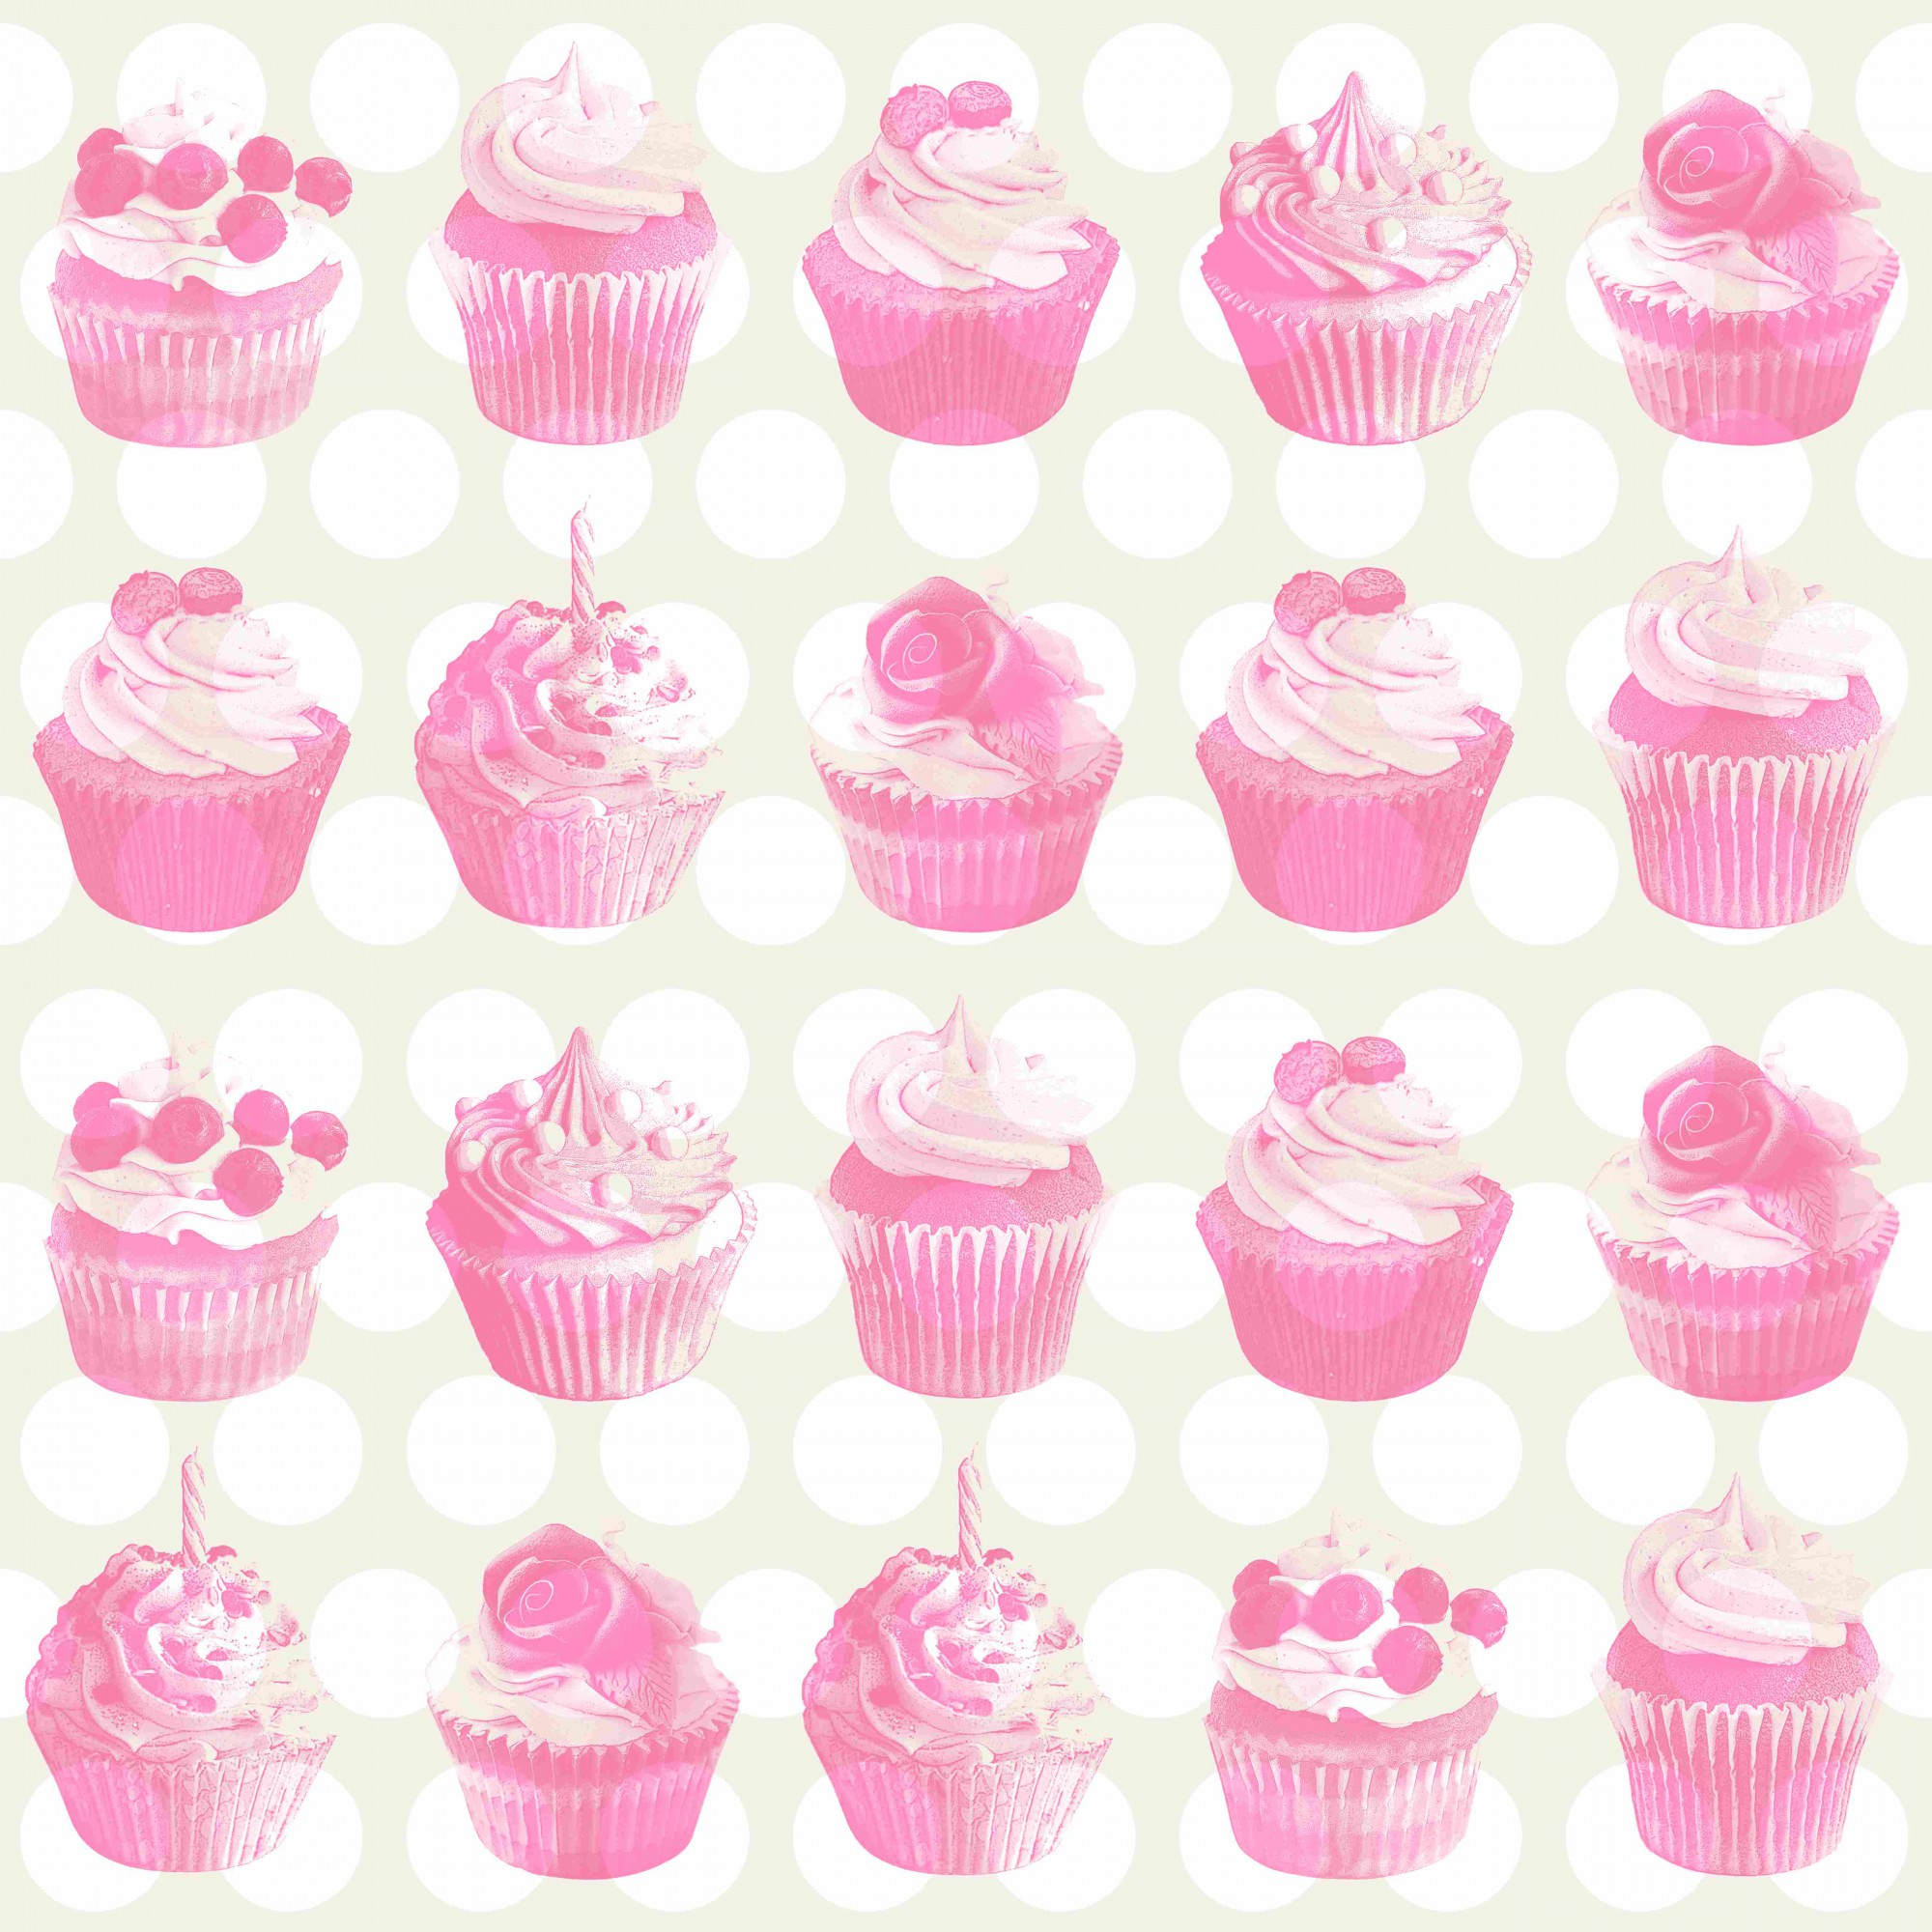 Details about Tapete Vlies Cupcake Metallic rosa beige weiß Everybody ...